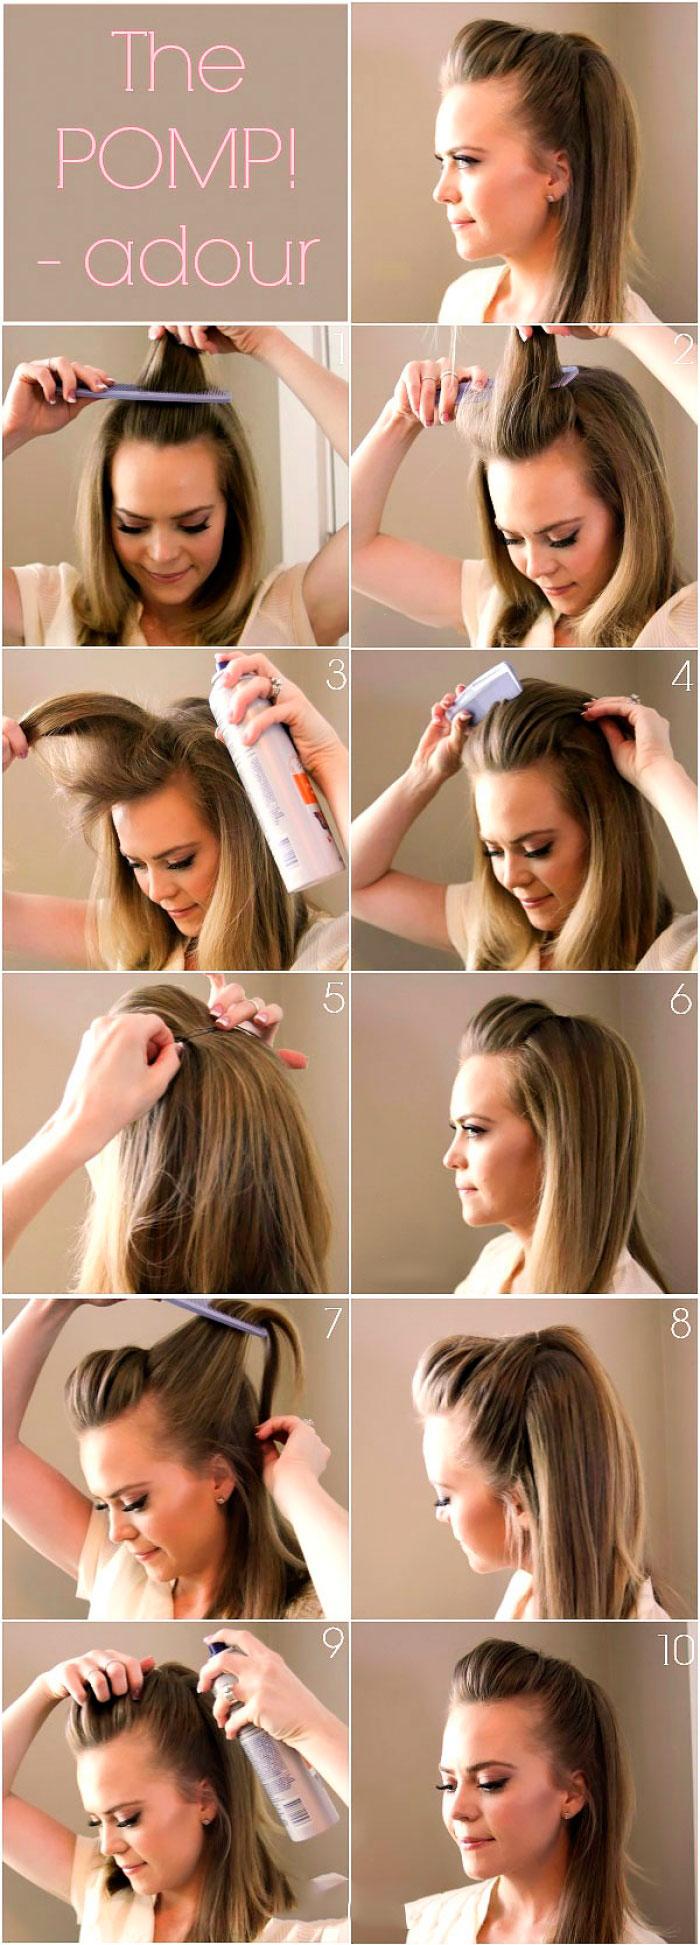 Объем волос в домашних условиях